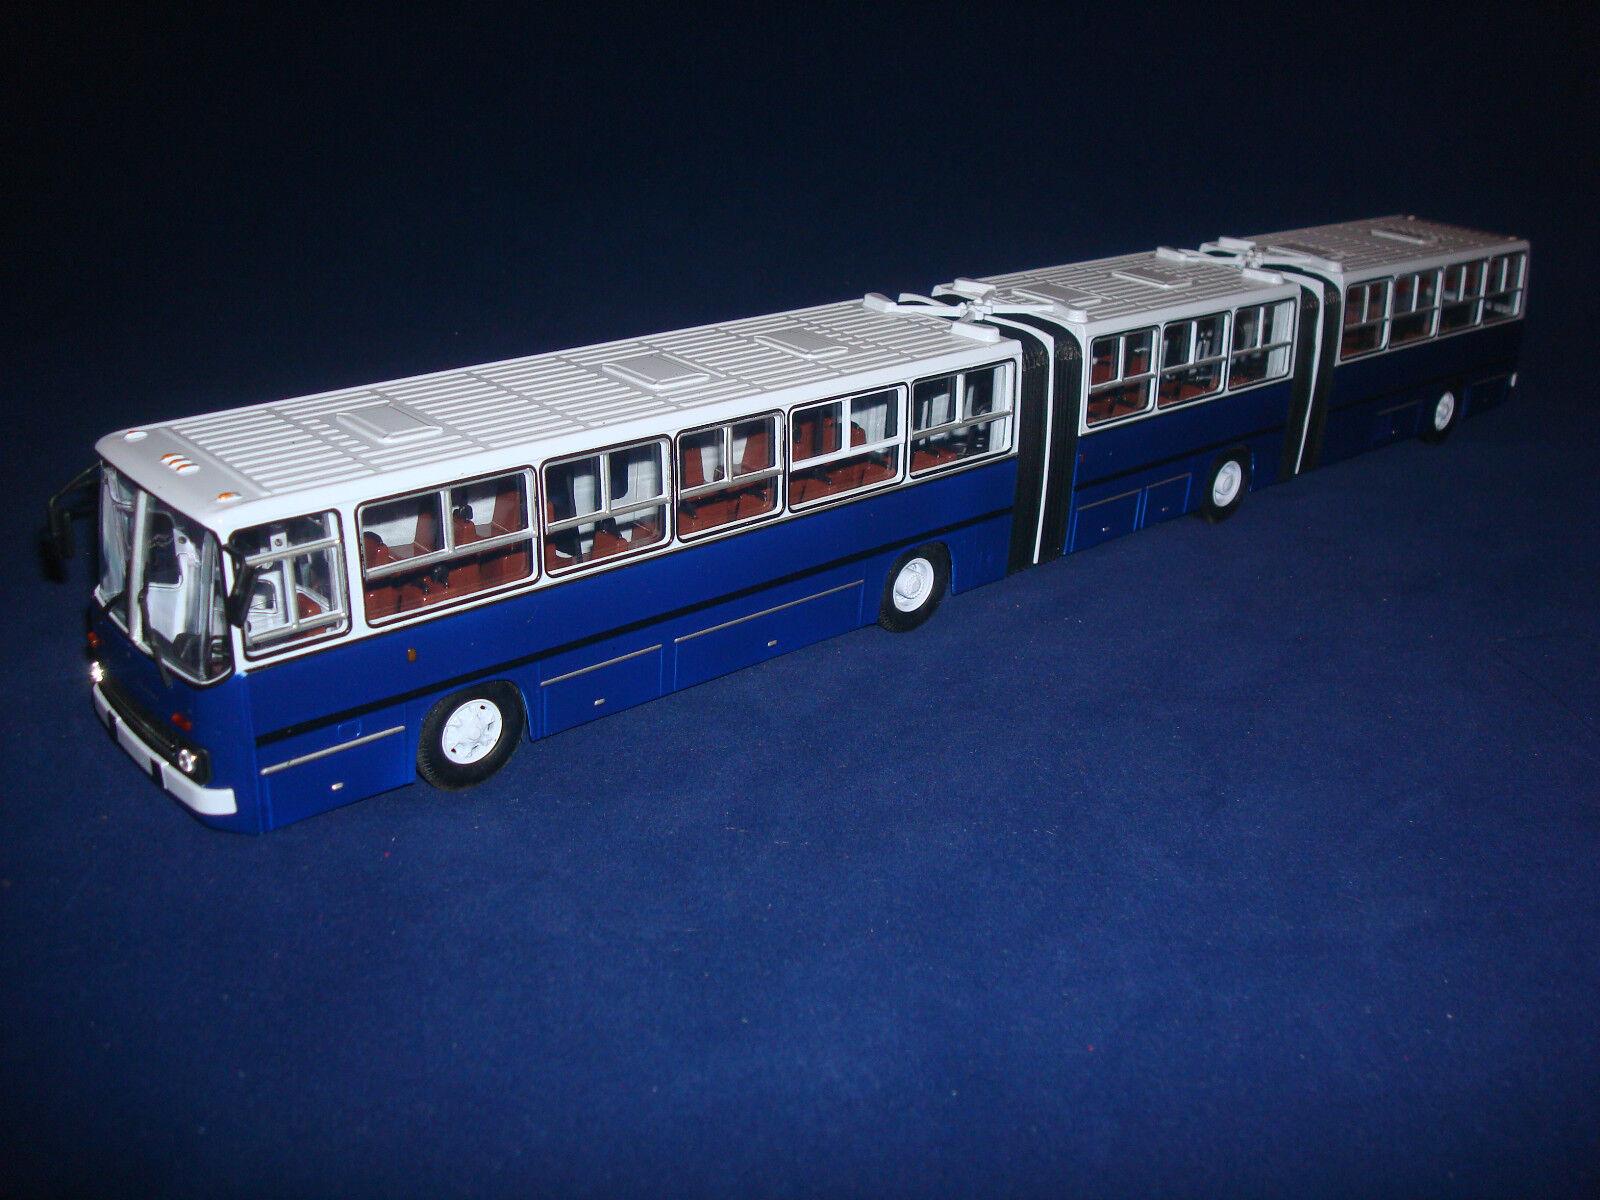 Ikarus 293 Germany Hungary Hungary Hungary USSR Soveit Bus 1:43 8e5a88